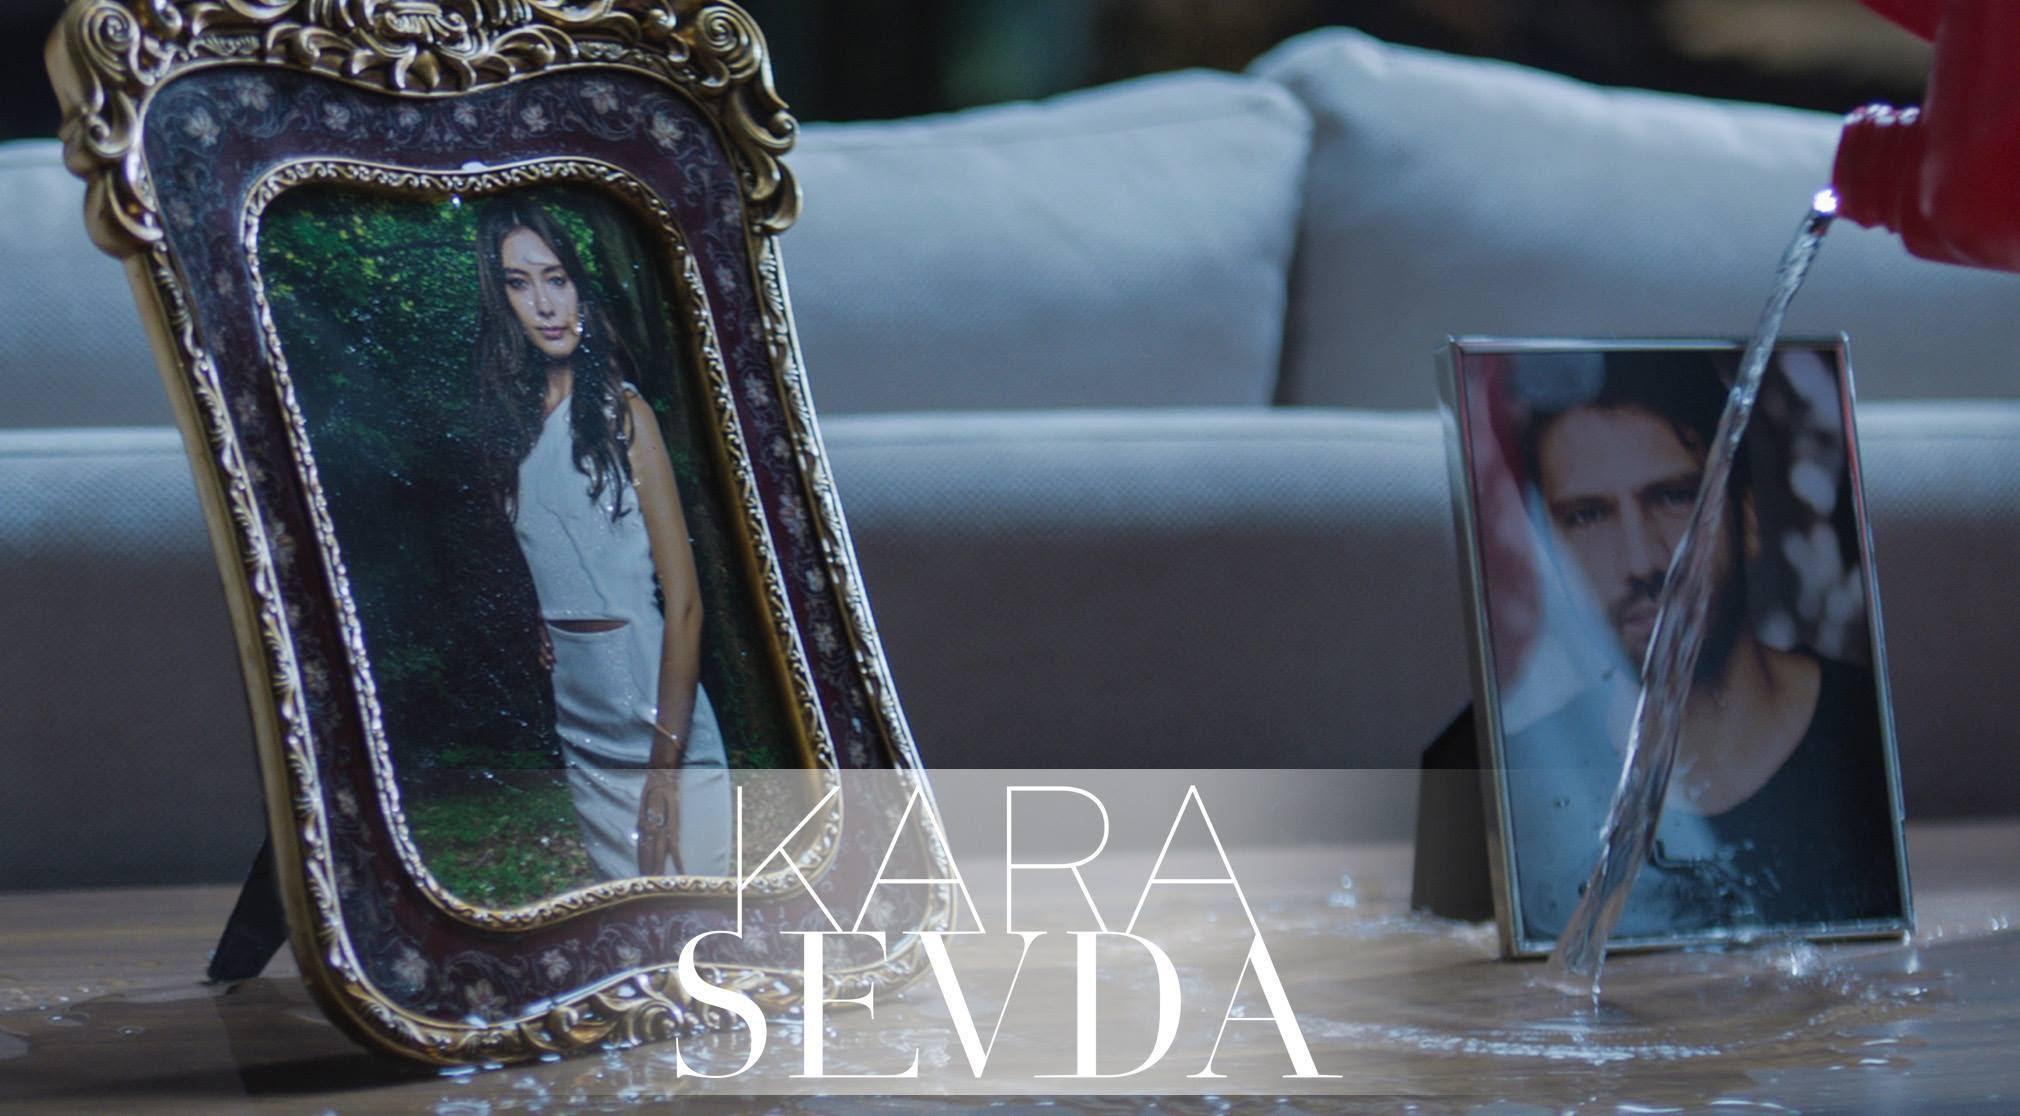 Kara Sevda Β΄Κύκλος Επεισόδιο 1, 2, 3, 4, 5 Περιλήψεις